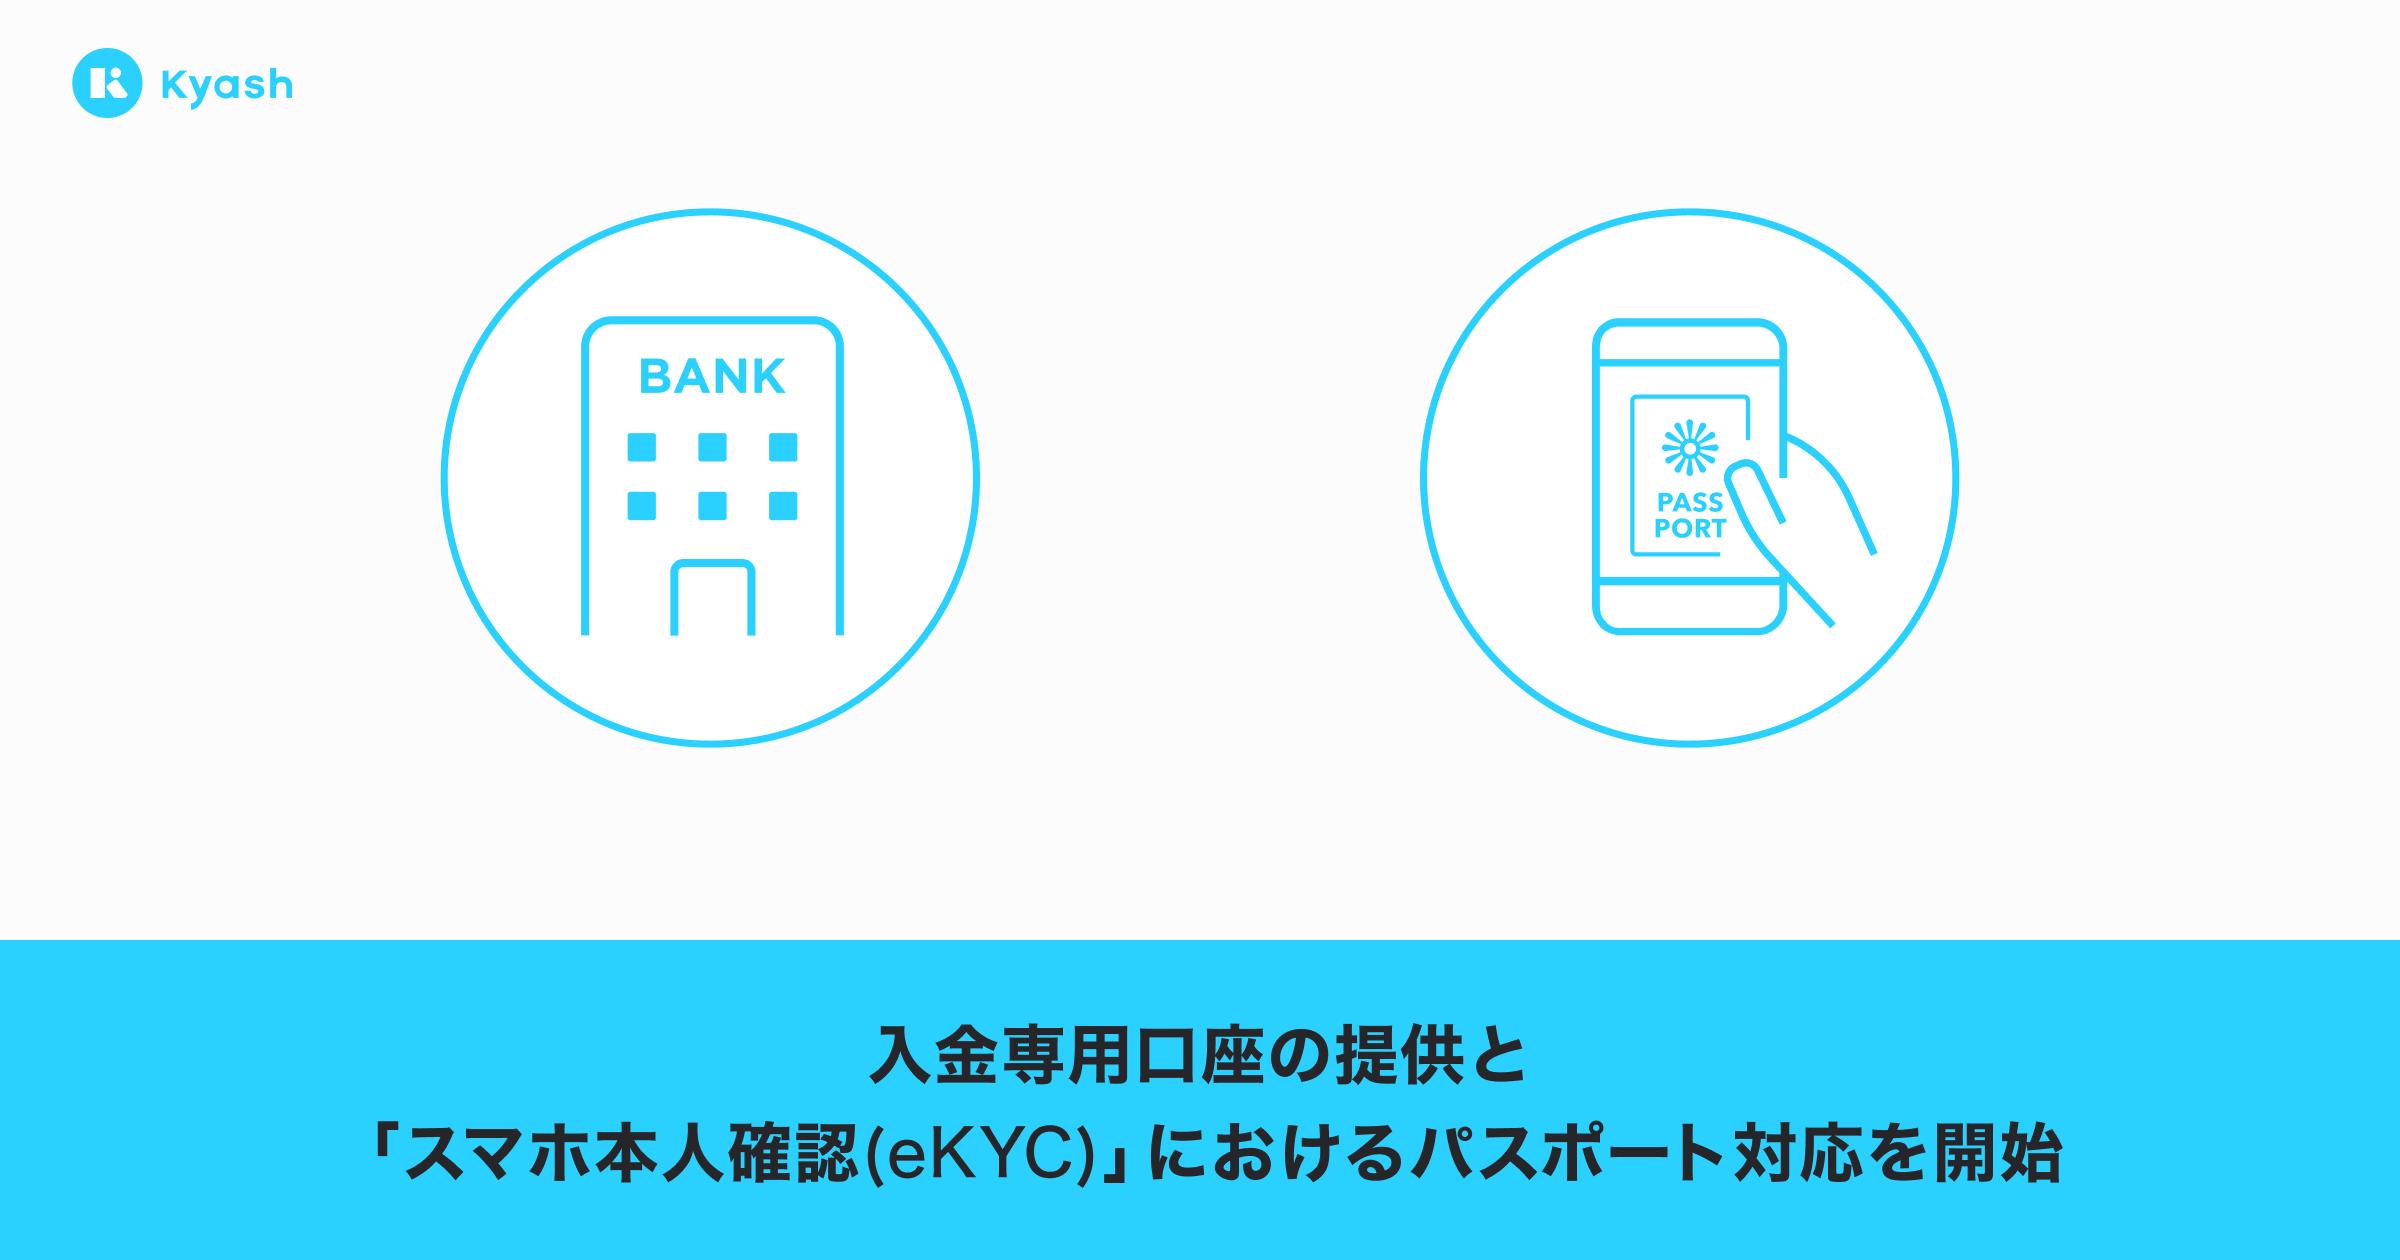 Kyash、入金専用口座の提供と「スマホ本人確認(eKYC)」におけるパスポート対応を開始